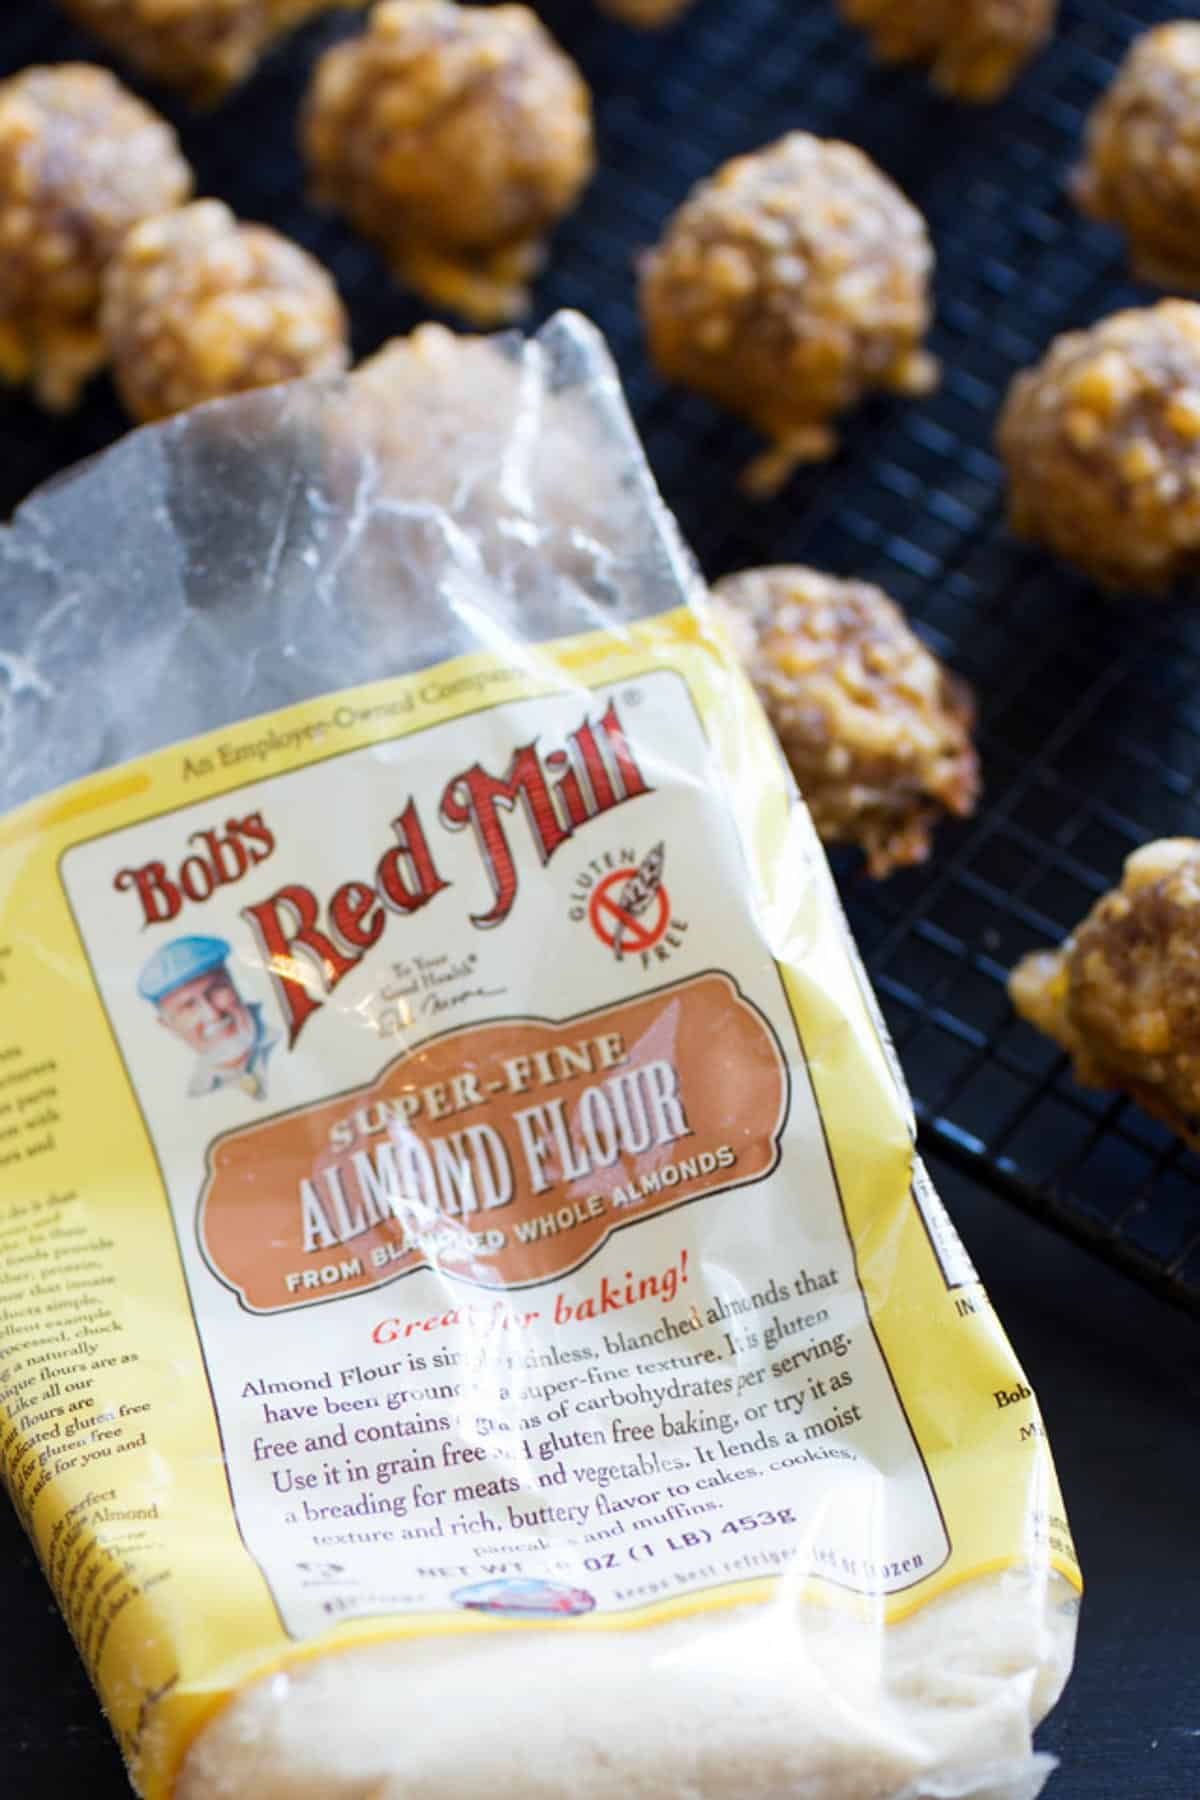 Sausage balls next to a bag of almond flour.